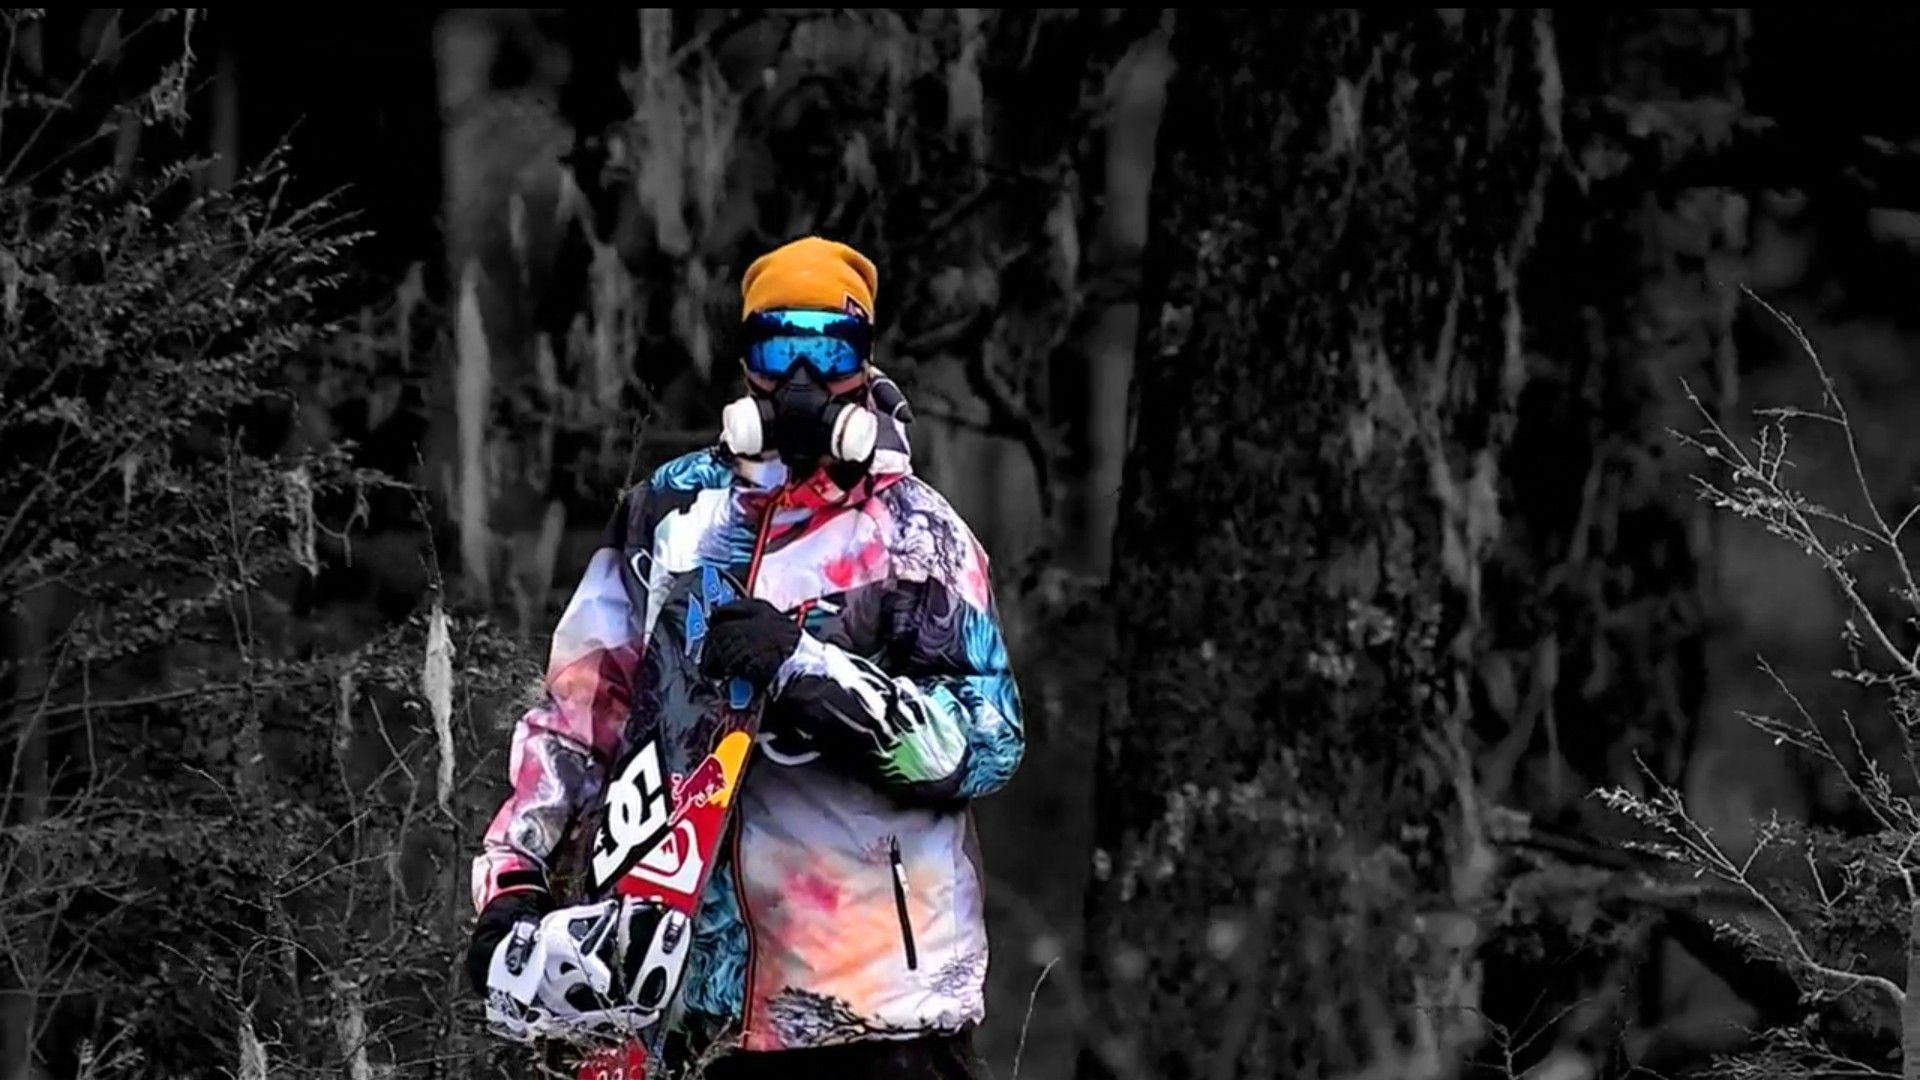 Wallpaper Hd Snowboarding Wallpaper Iphone